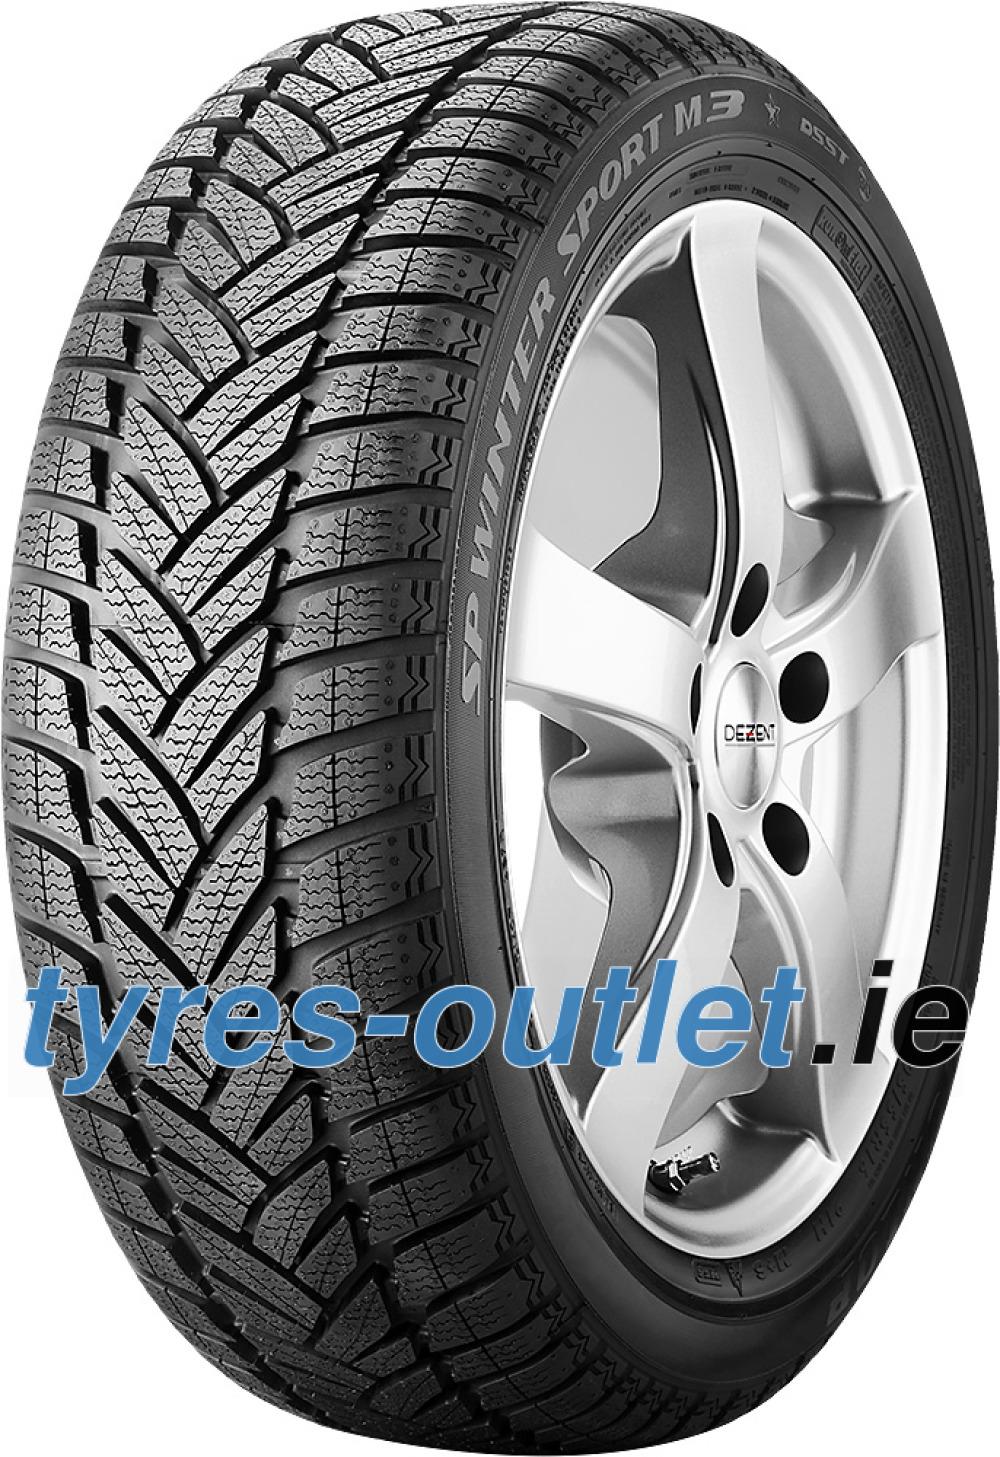 Dunlop SP Winter Sport M3 ROF ( 245/40 R18 97V XL , runflat, with rim protection (MFS), AO )